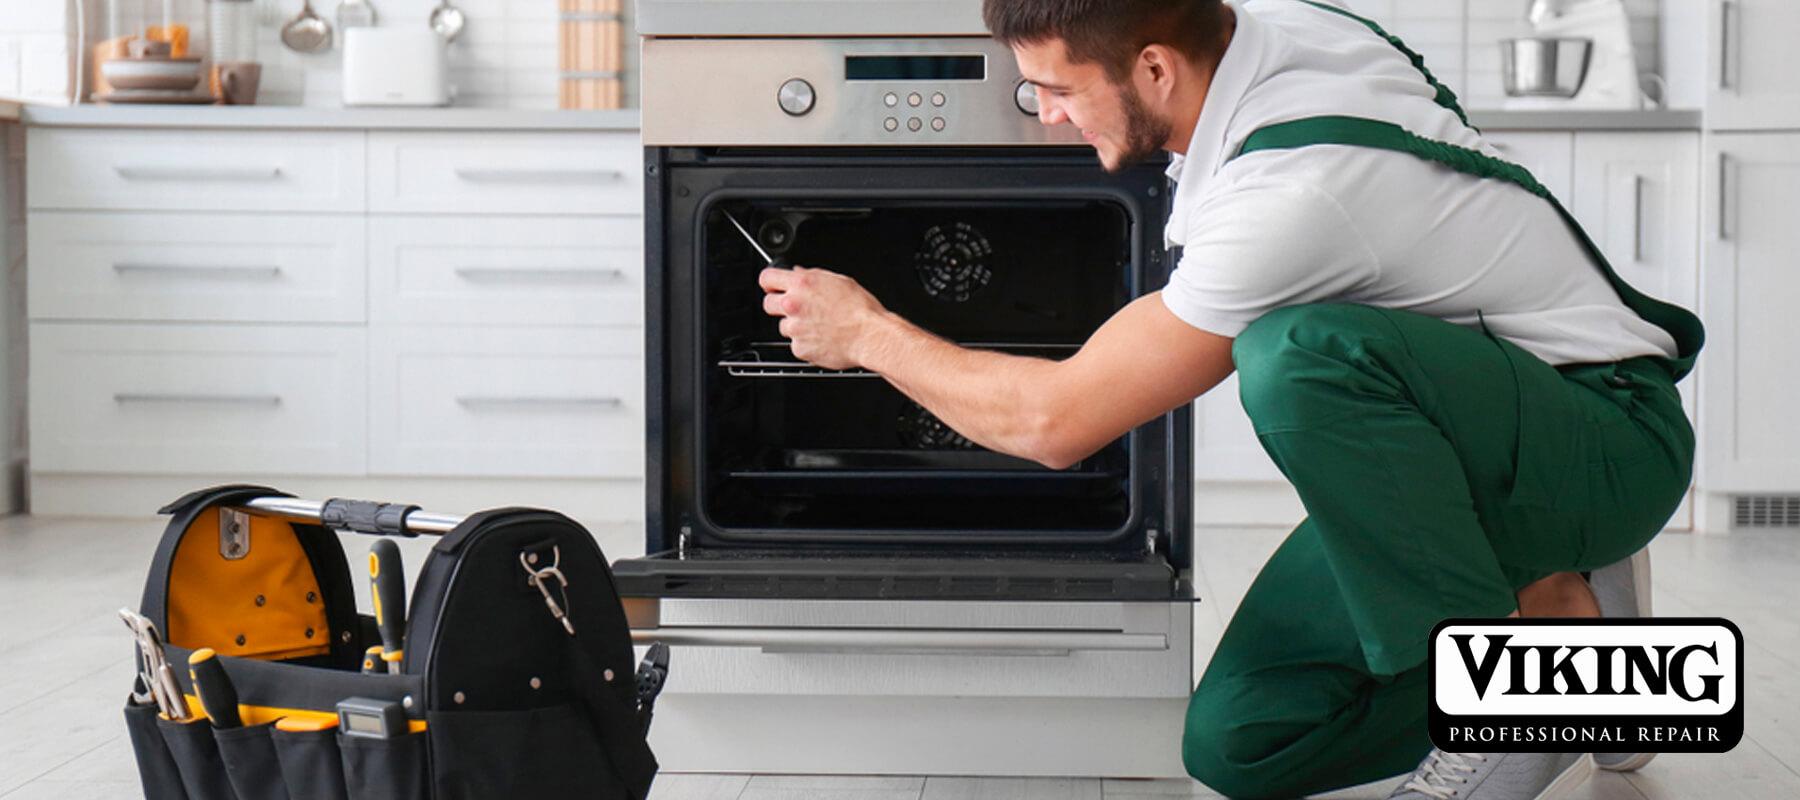 Authorized Viking Appliance Repair Service Altadena | Professional Viking Repair